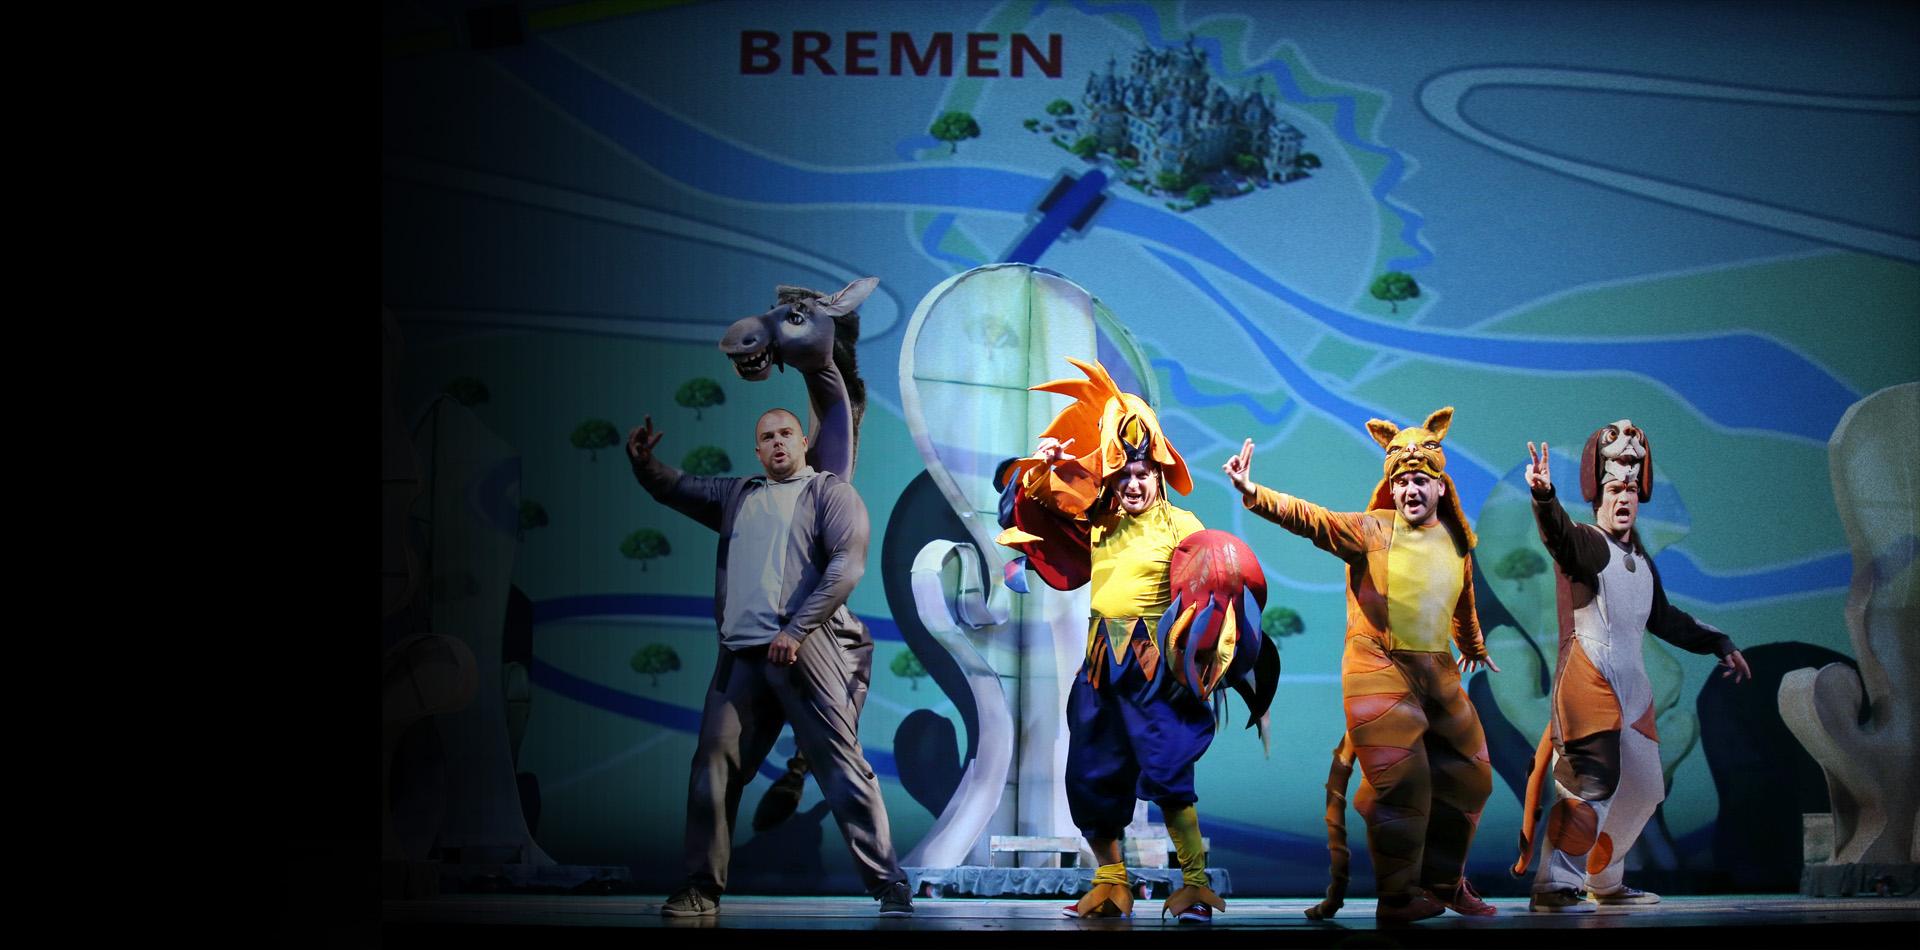 TOWN MUSICIANS OF BREMEN